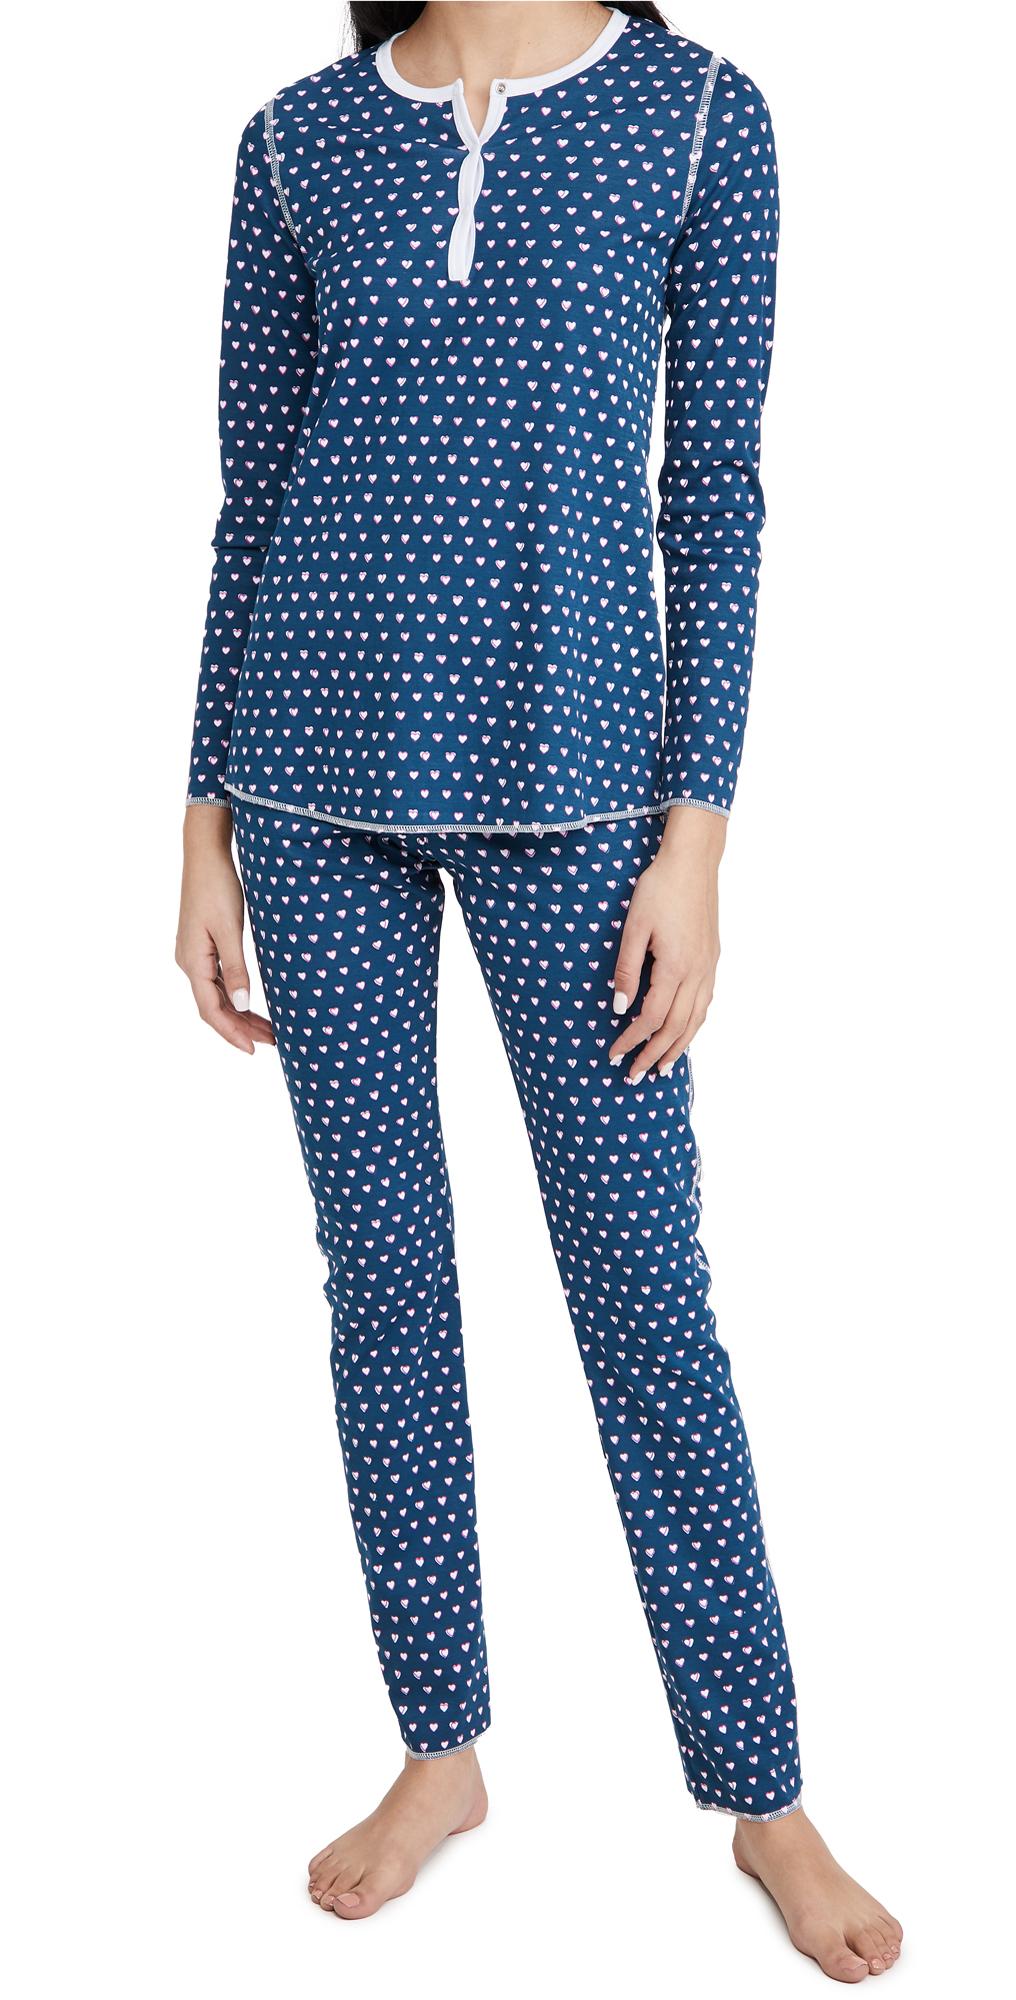 Roller Rabbit Hearts Pajamas Set